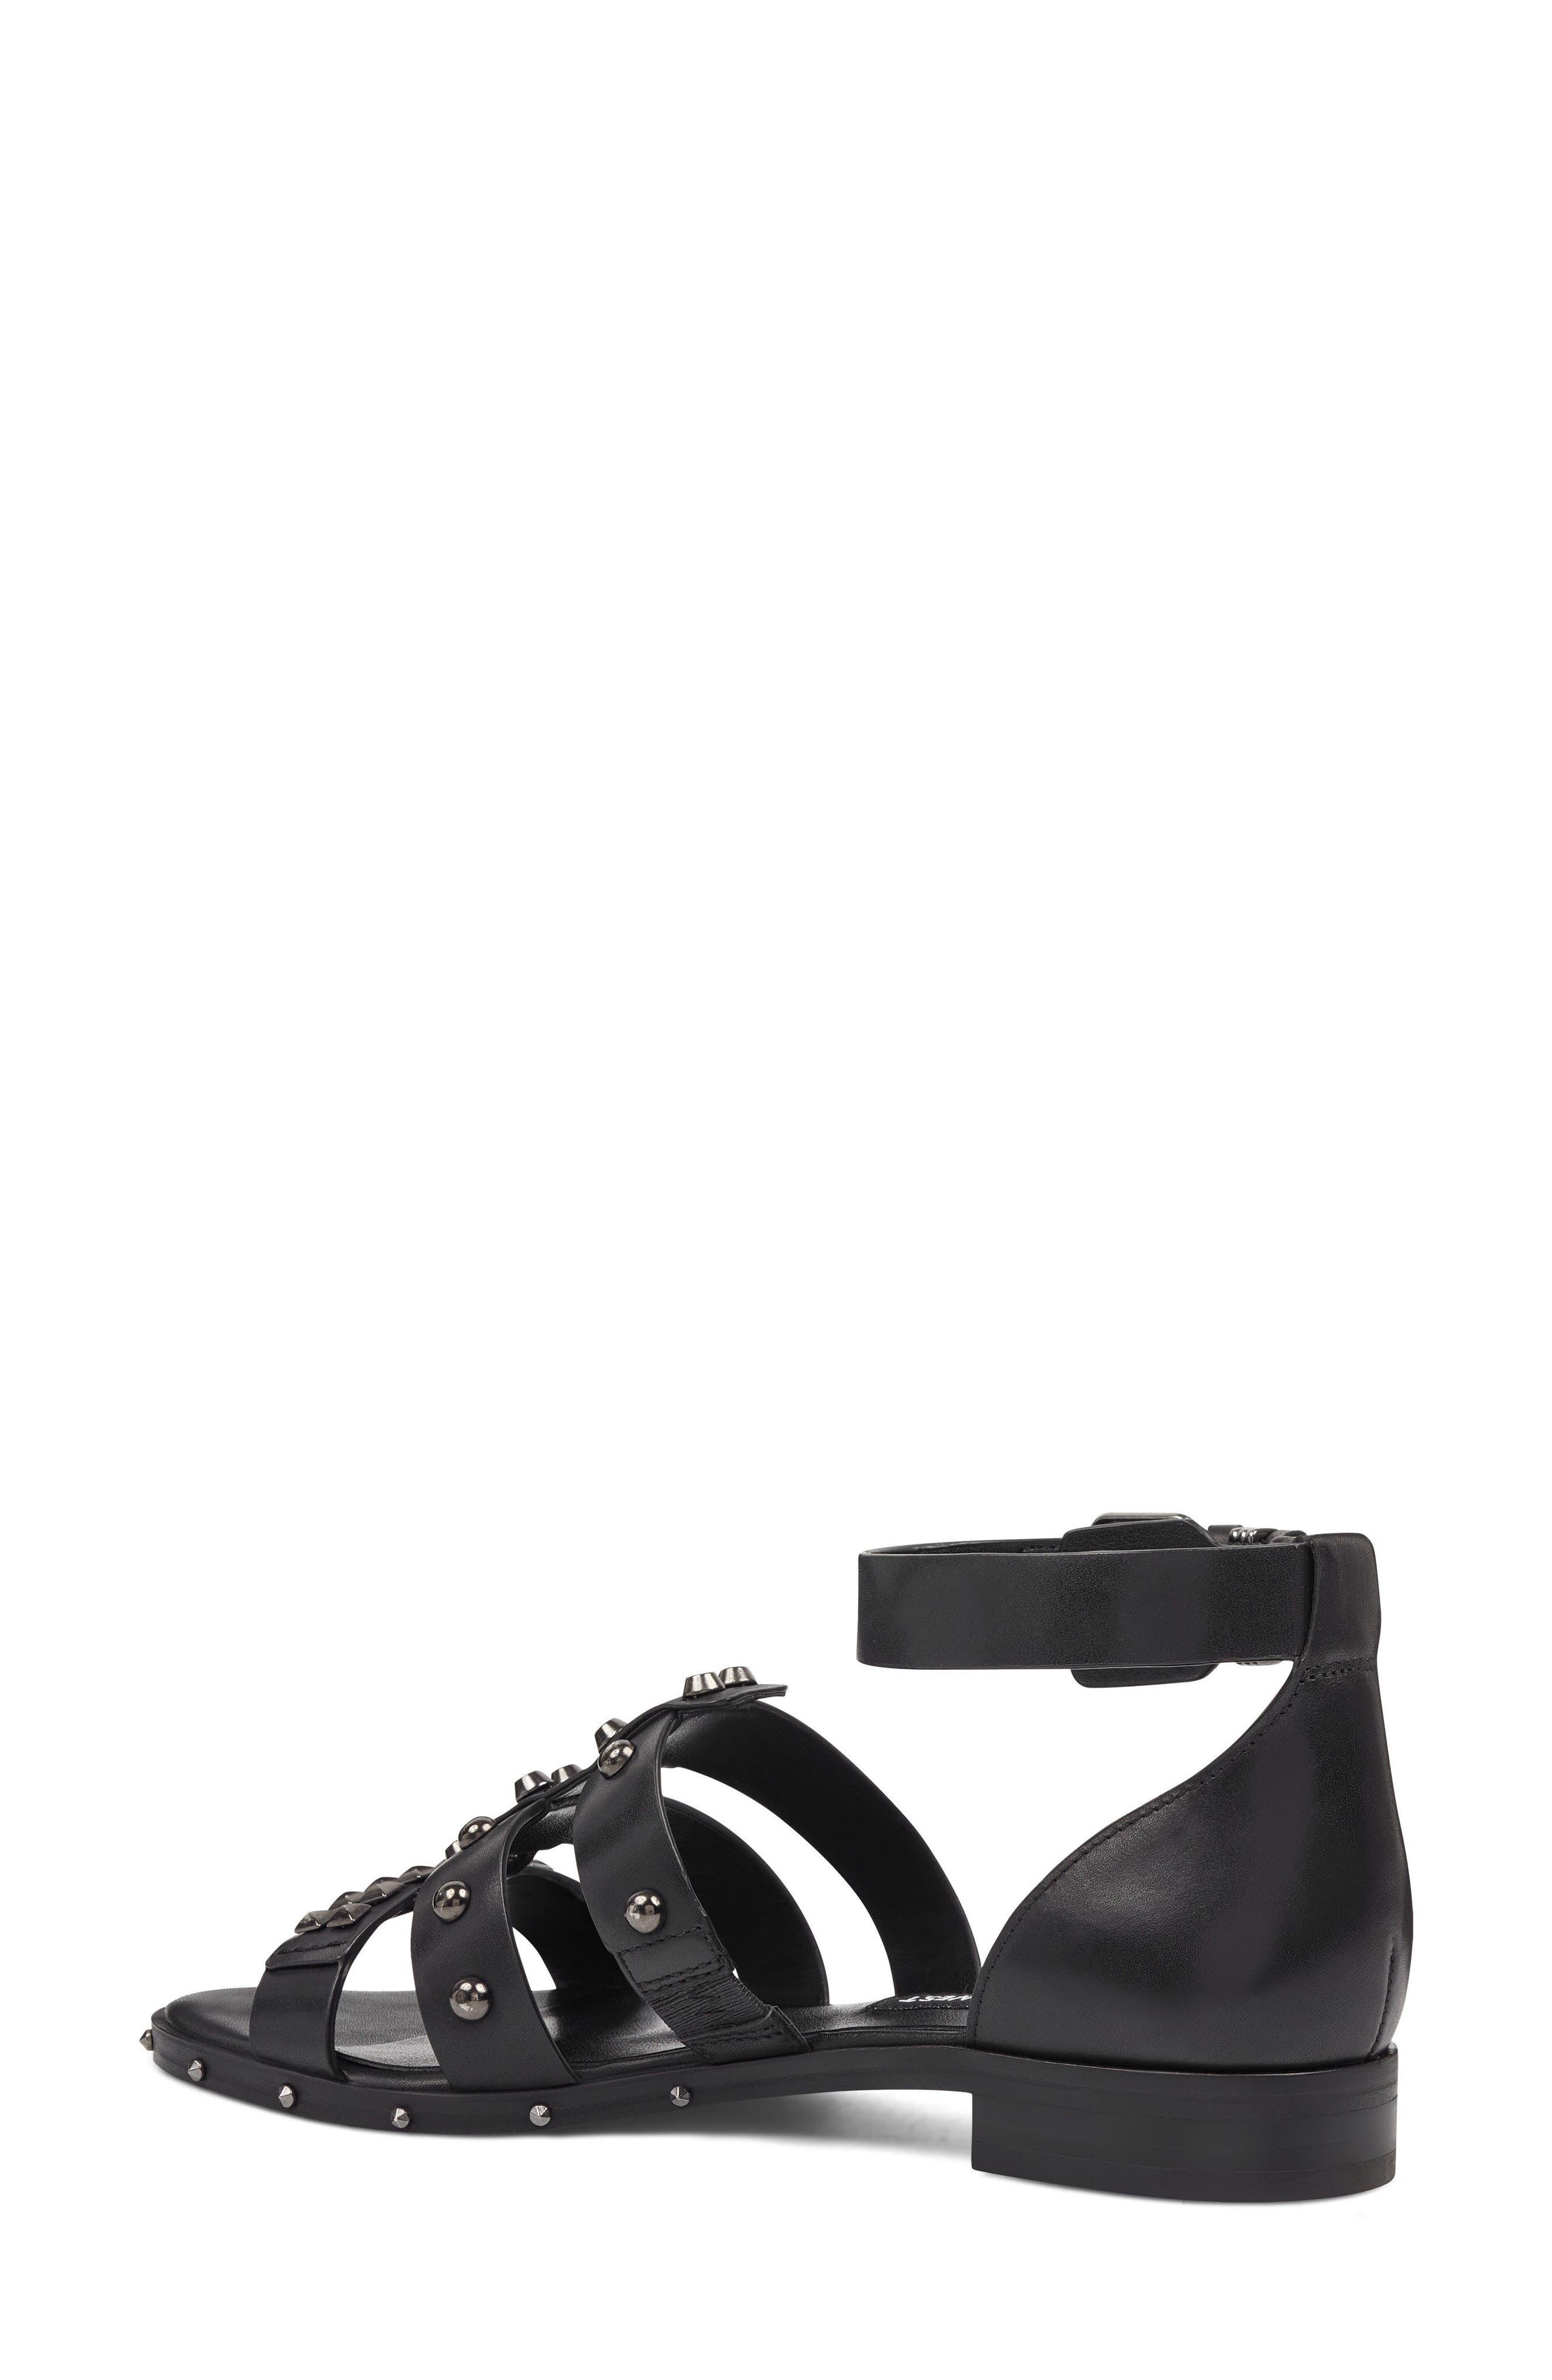 Corisande Sandal,                             Alternate thumbnail 2, color,                             BLACK LEATHER